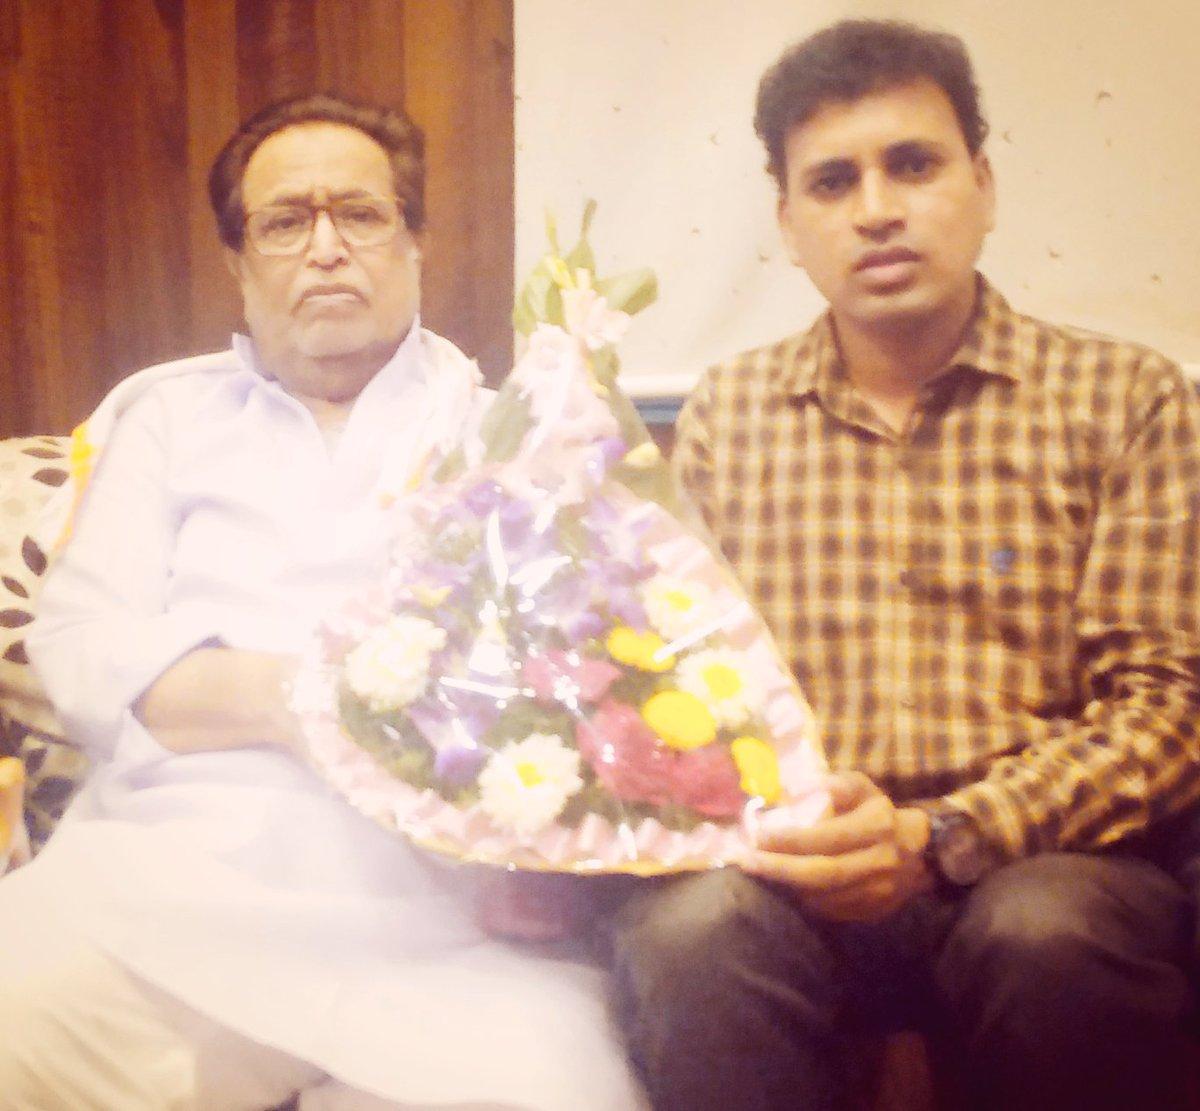 With Living Legend Pndt. @hdmangeshkar  Ji  Feel so lucky to get an opportunity to meet him &amp; seek his blessings  #LataMangeshkar #Music <br>http://pic.twitter.com/PBkKtCAeFE